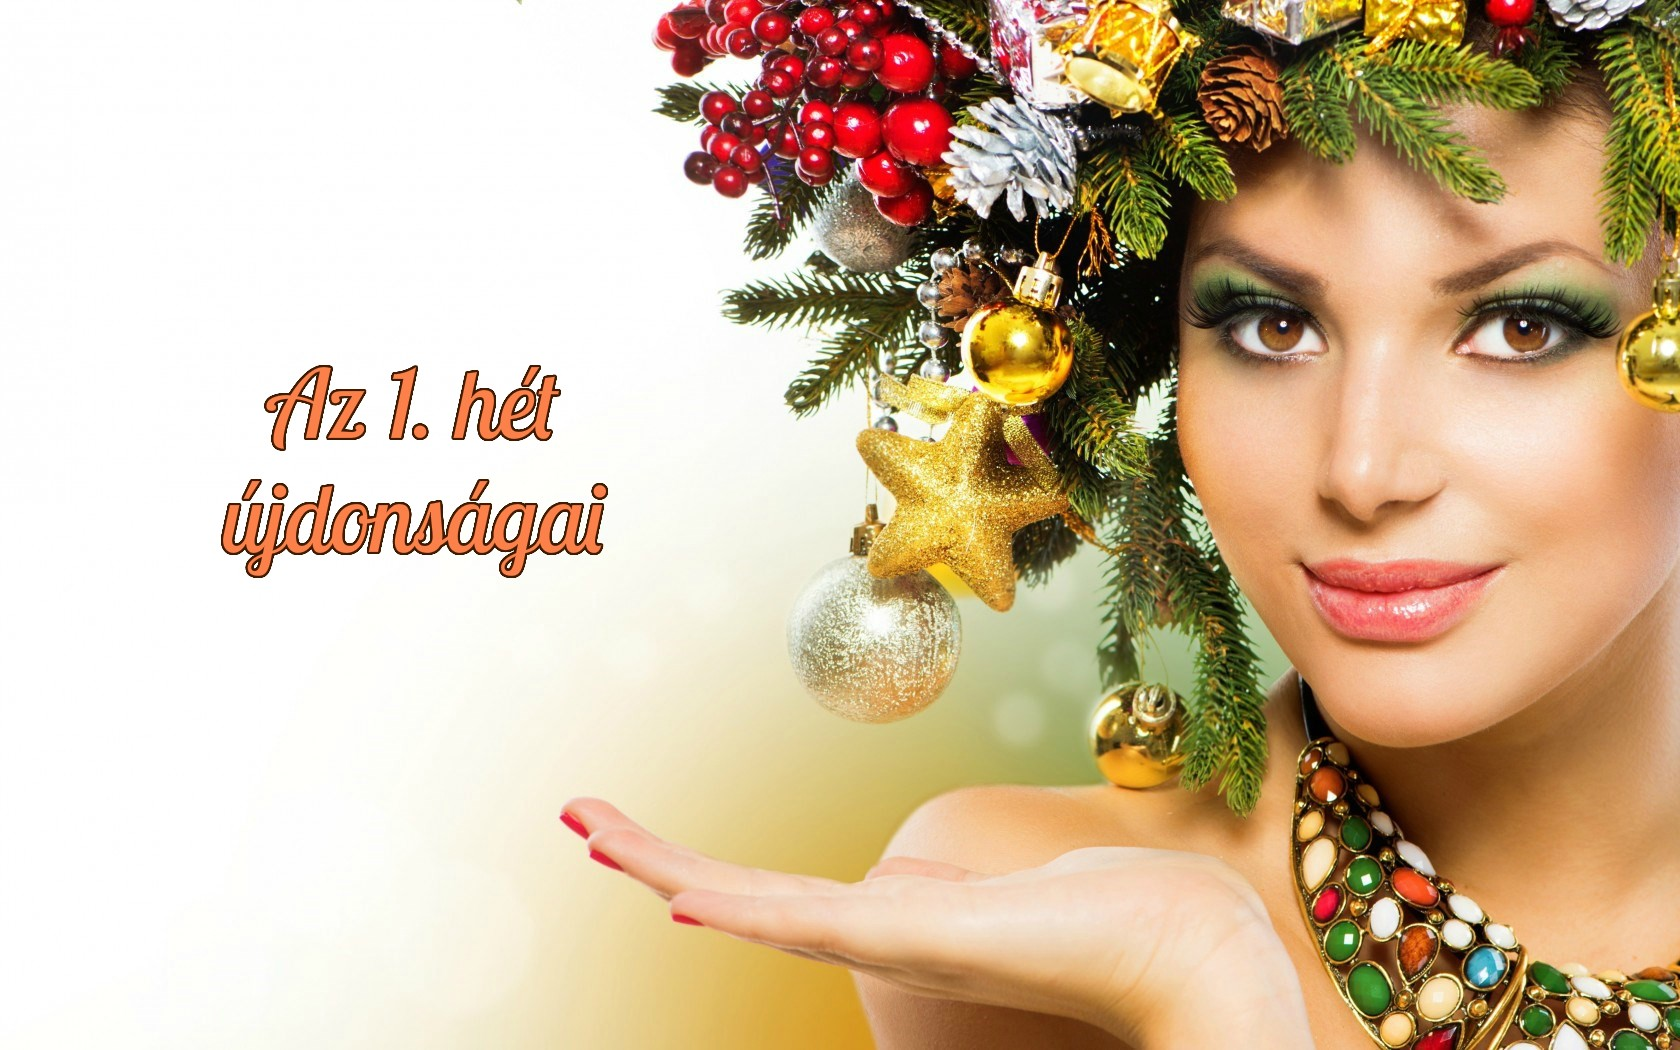 girl-happiness-make-up-laurel-christmas-new-year-photo-hd-wallpaper.jpg